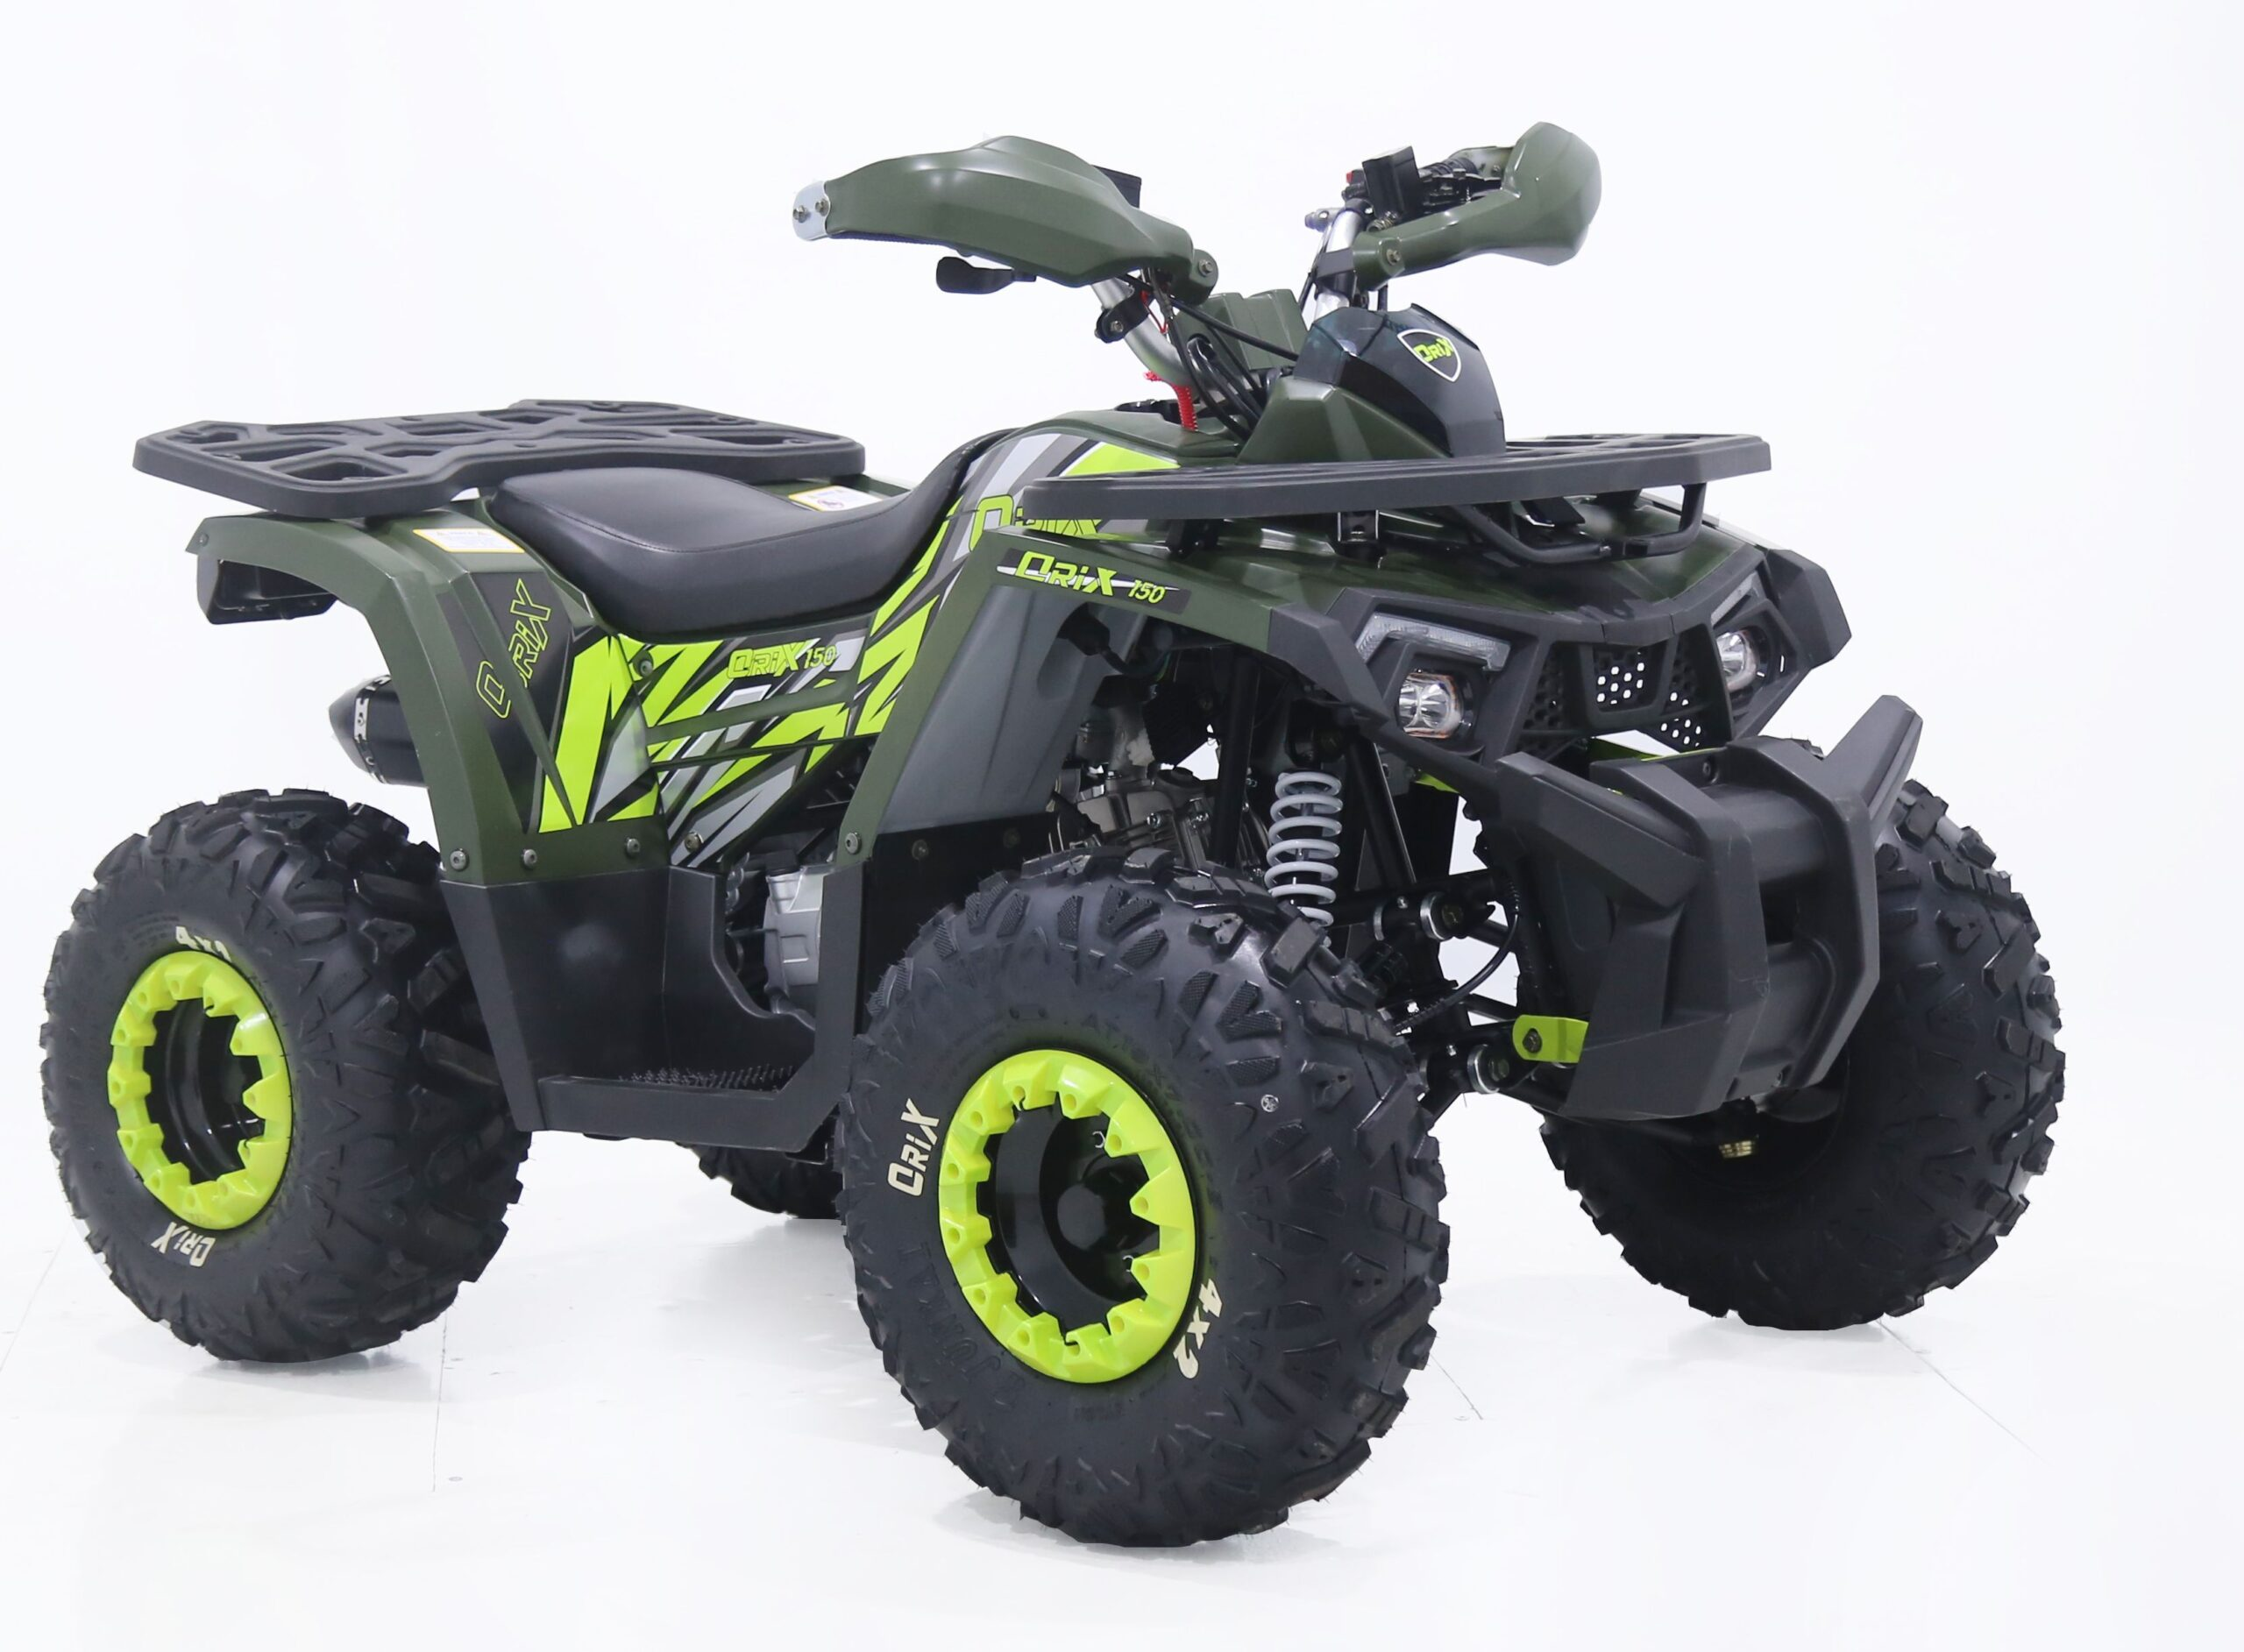 ДЕТСКИЙ КВАДРОЦИКЛ TAOTAO ORIX 150  Артмото - купить квадроцикл в украине и харькове, мотоцикл, снегоход, скутер, мопед, электромобиль